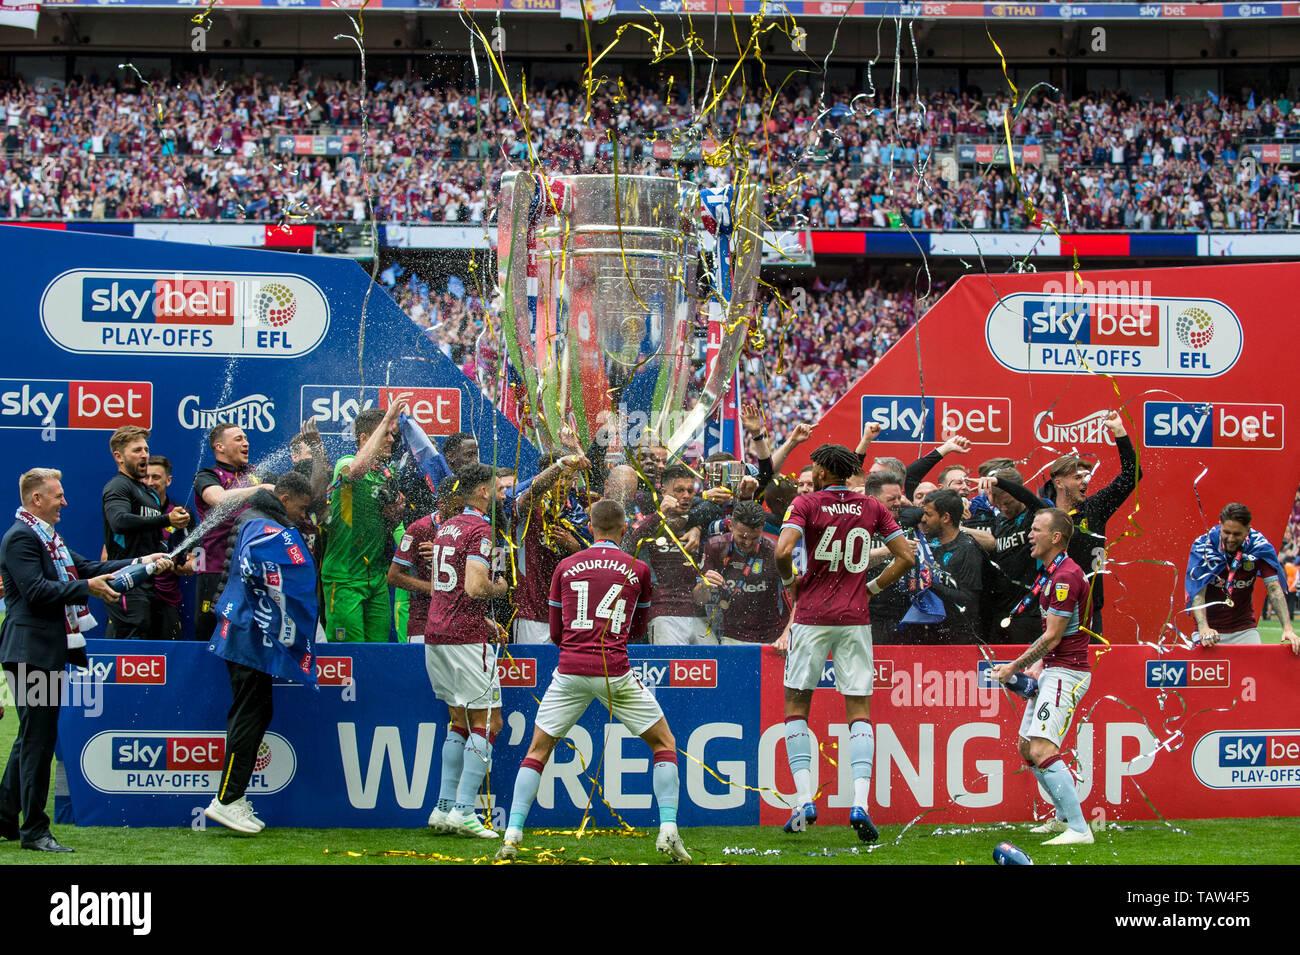 Efl Championship Football Club Winners Stock Photos & Efl